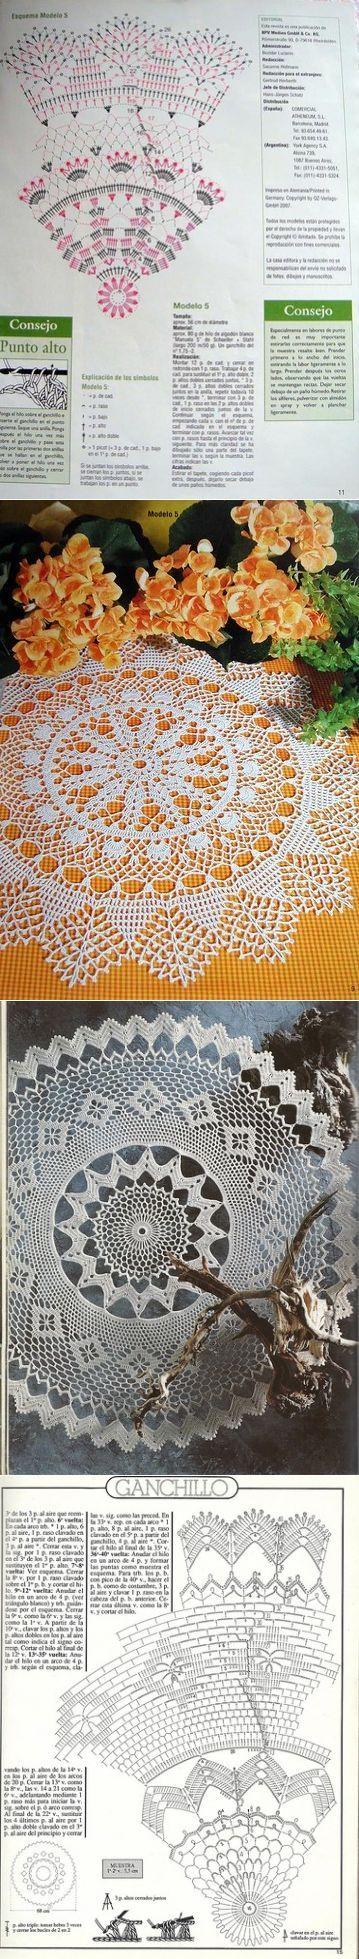 lace tablecloth...♥ Deniz ♥